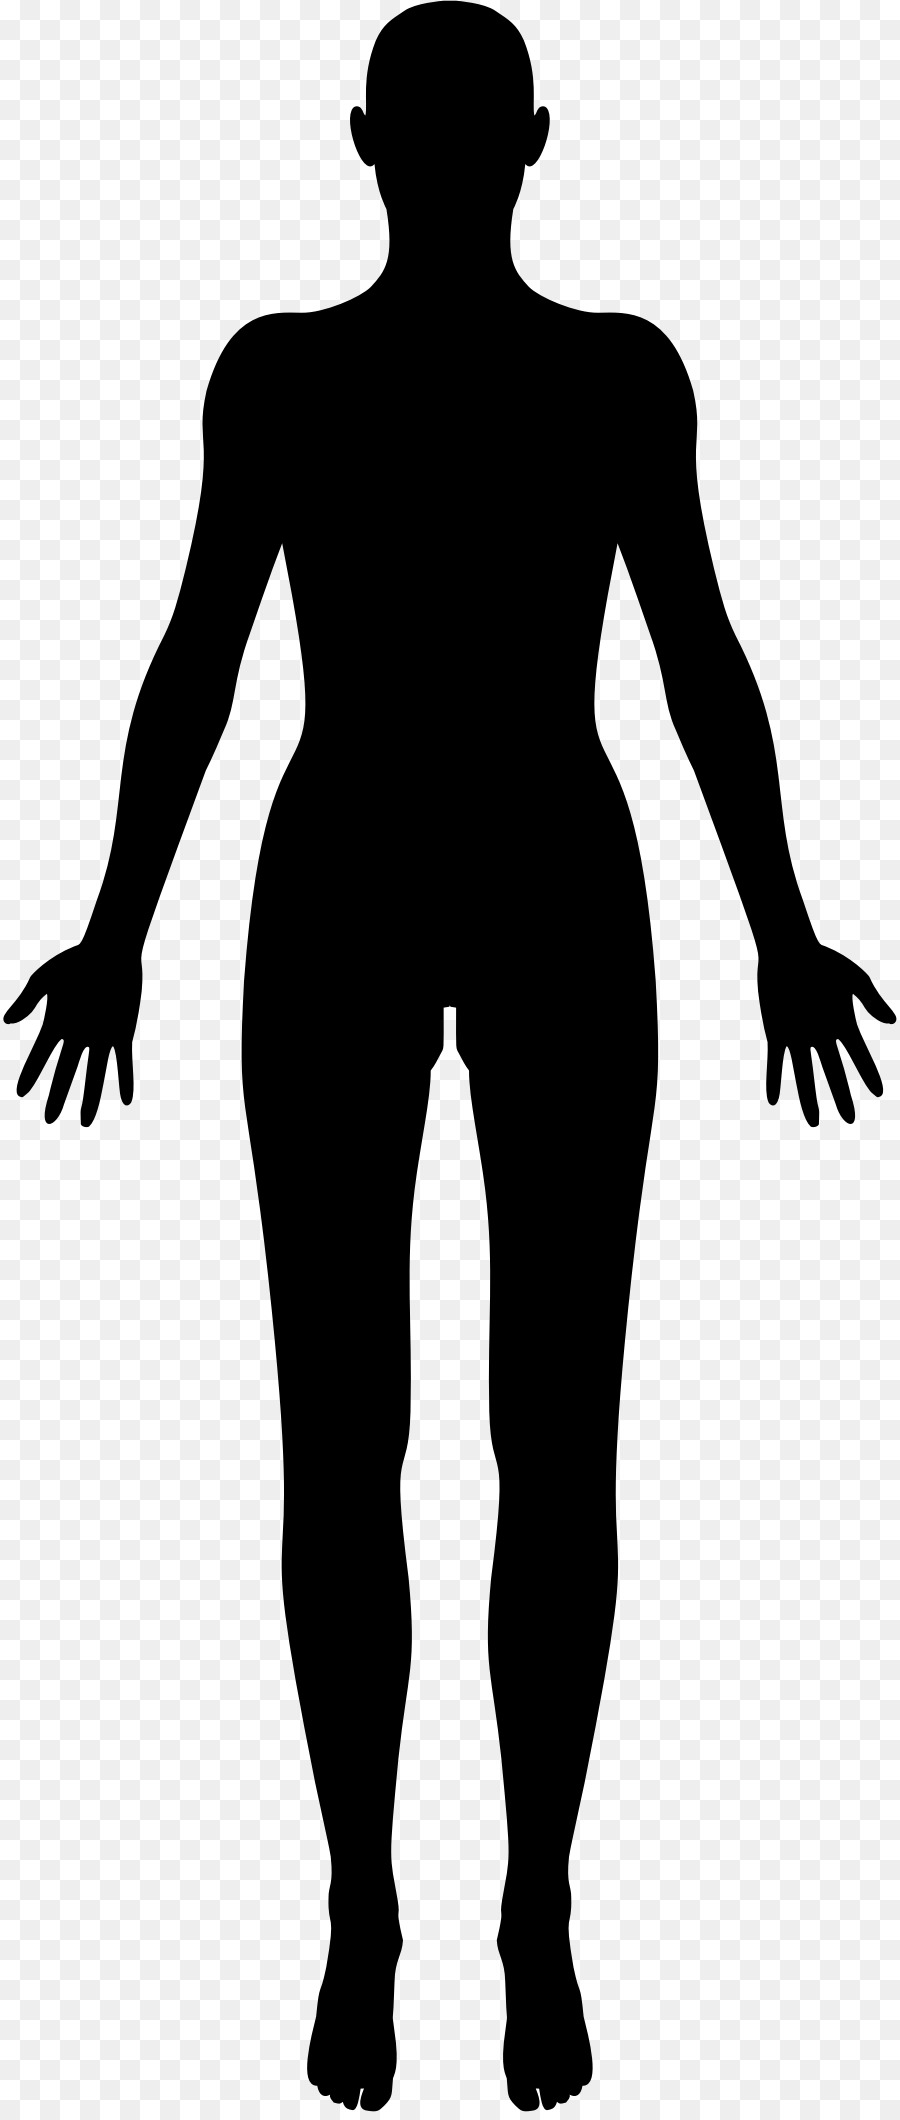 Silhouette Body Art.